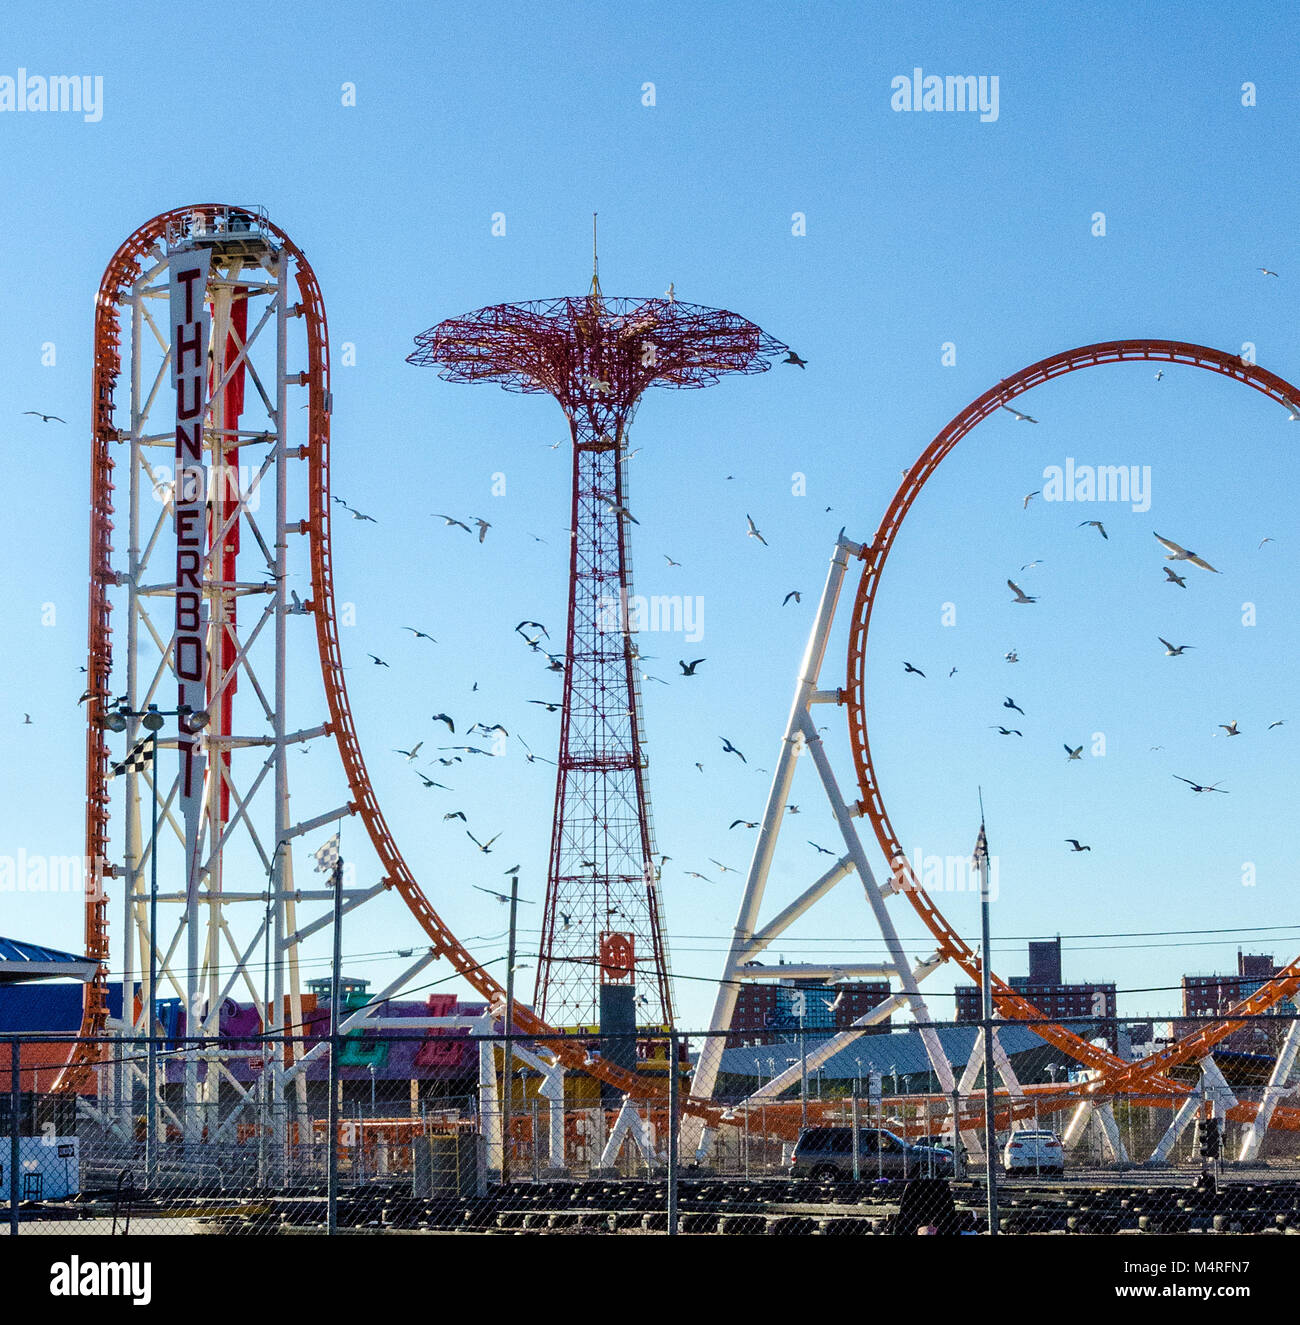 Coney Island Old Rides, New York USA - Stock Image